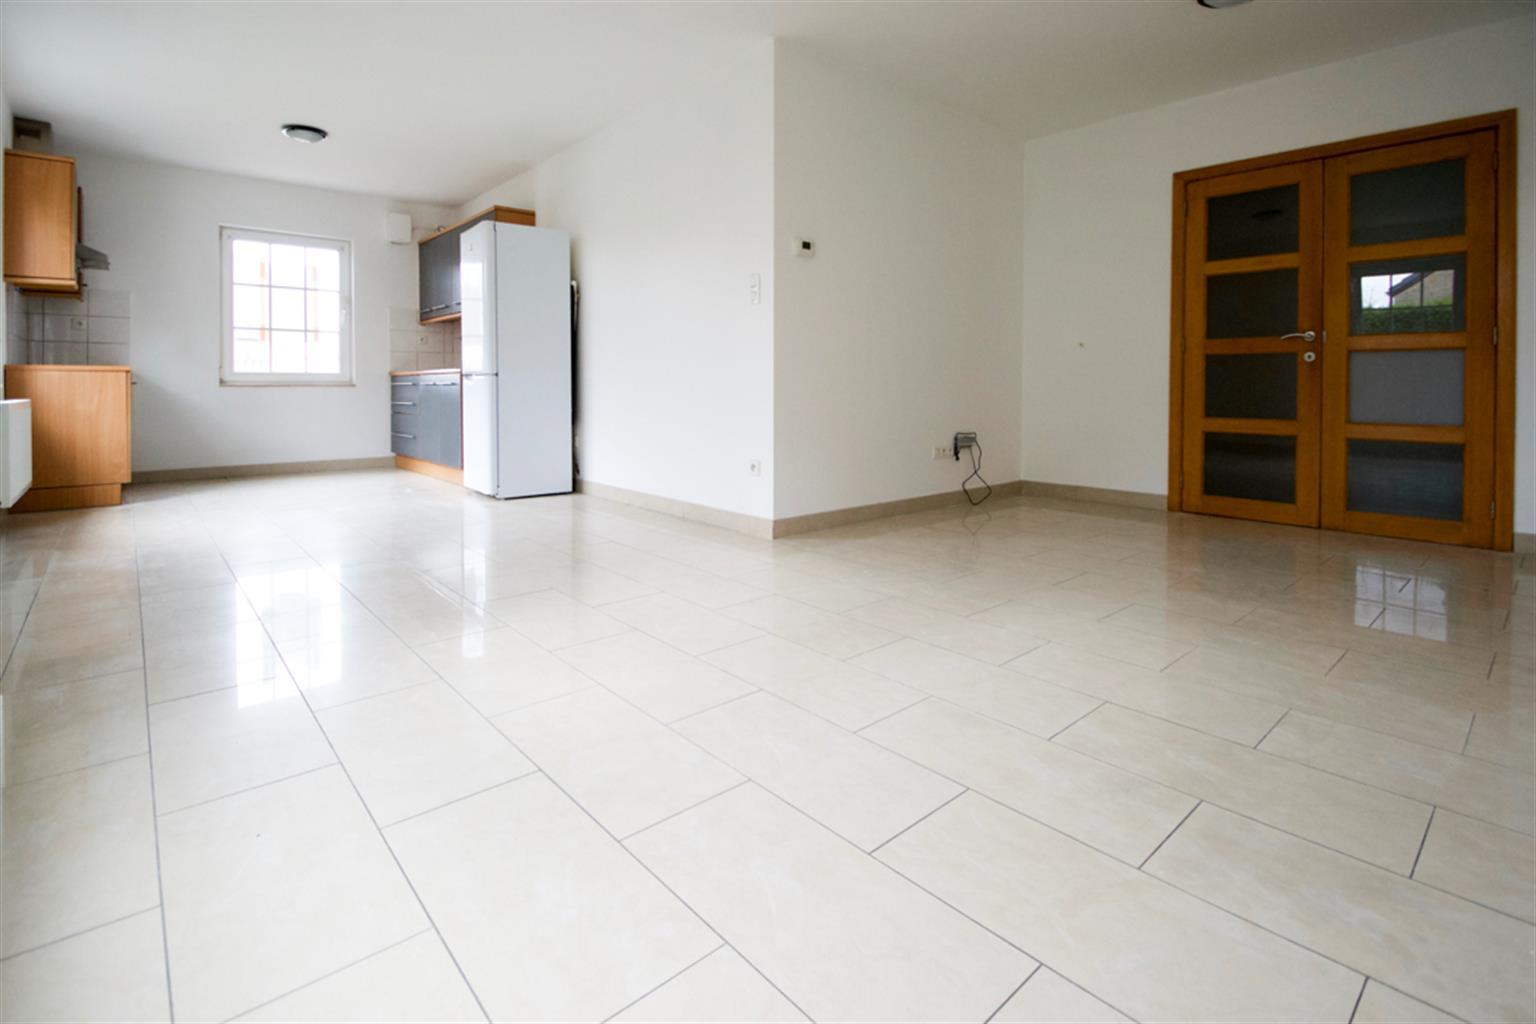 Appartement - Binche Leval-Trahegnies - #3269650-2